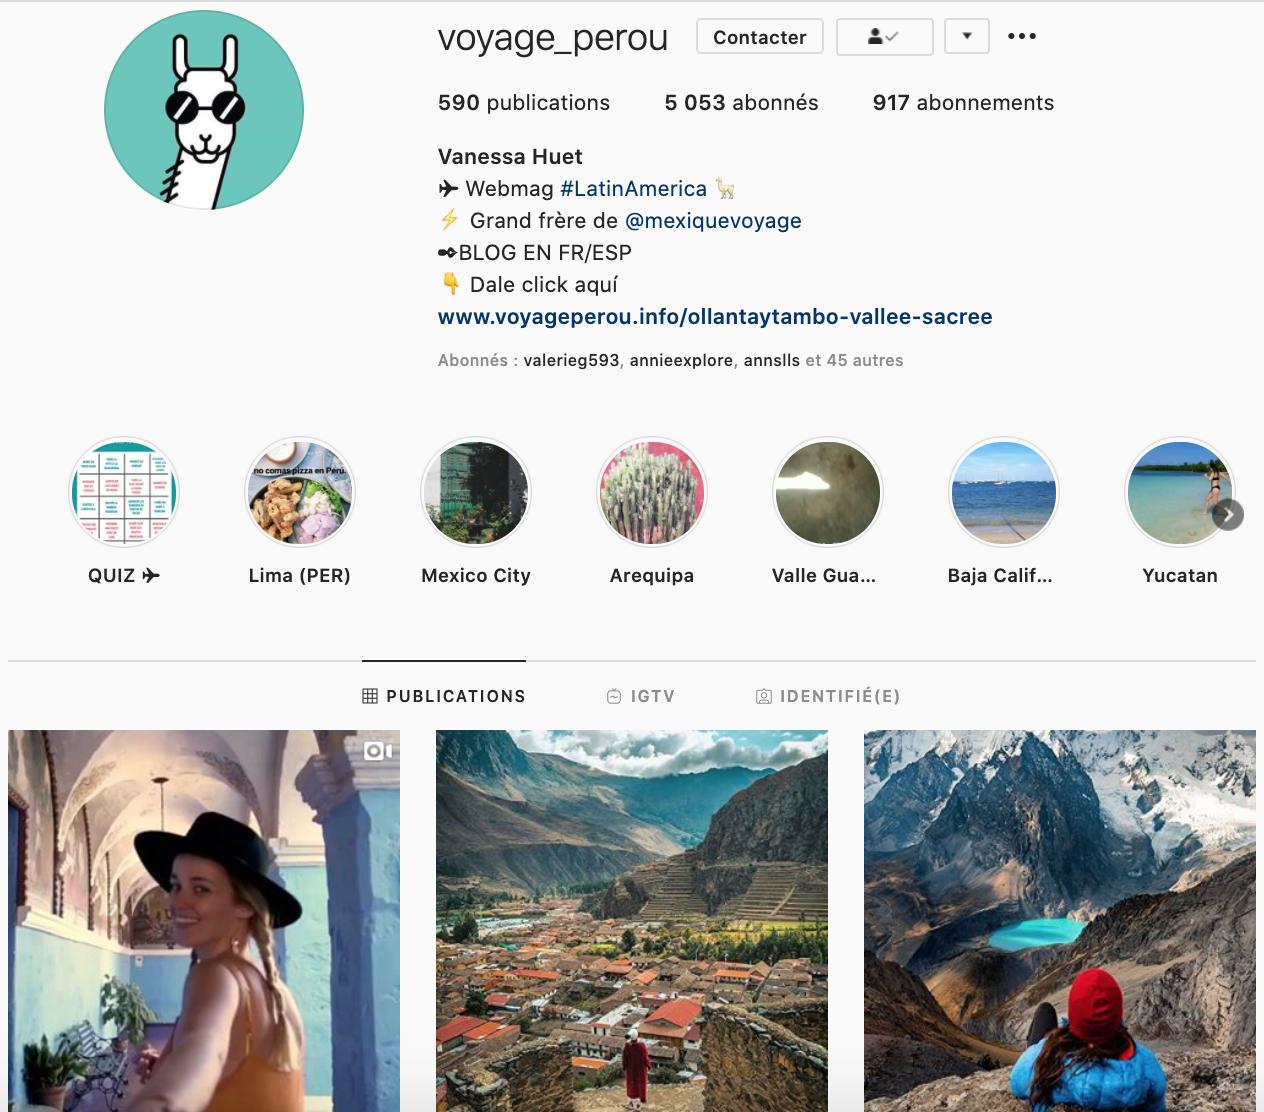 Voyage Pérou instagrammers favoris